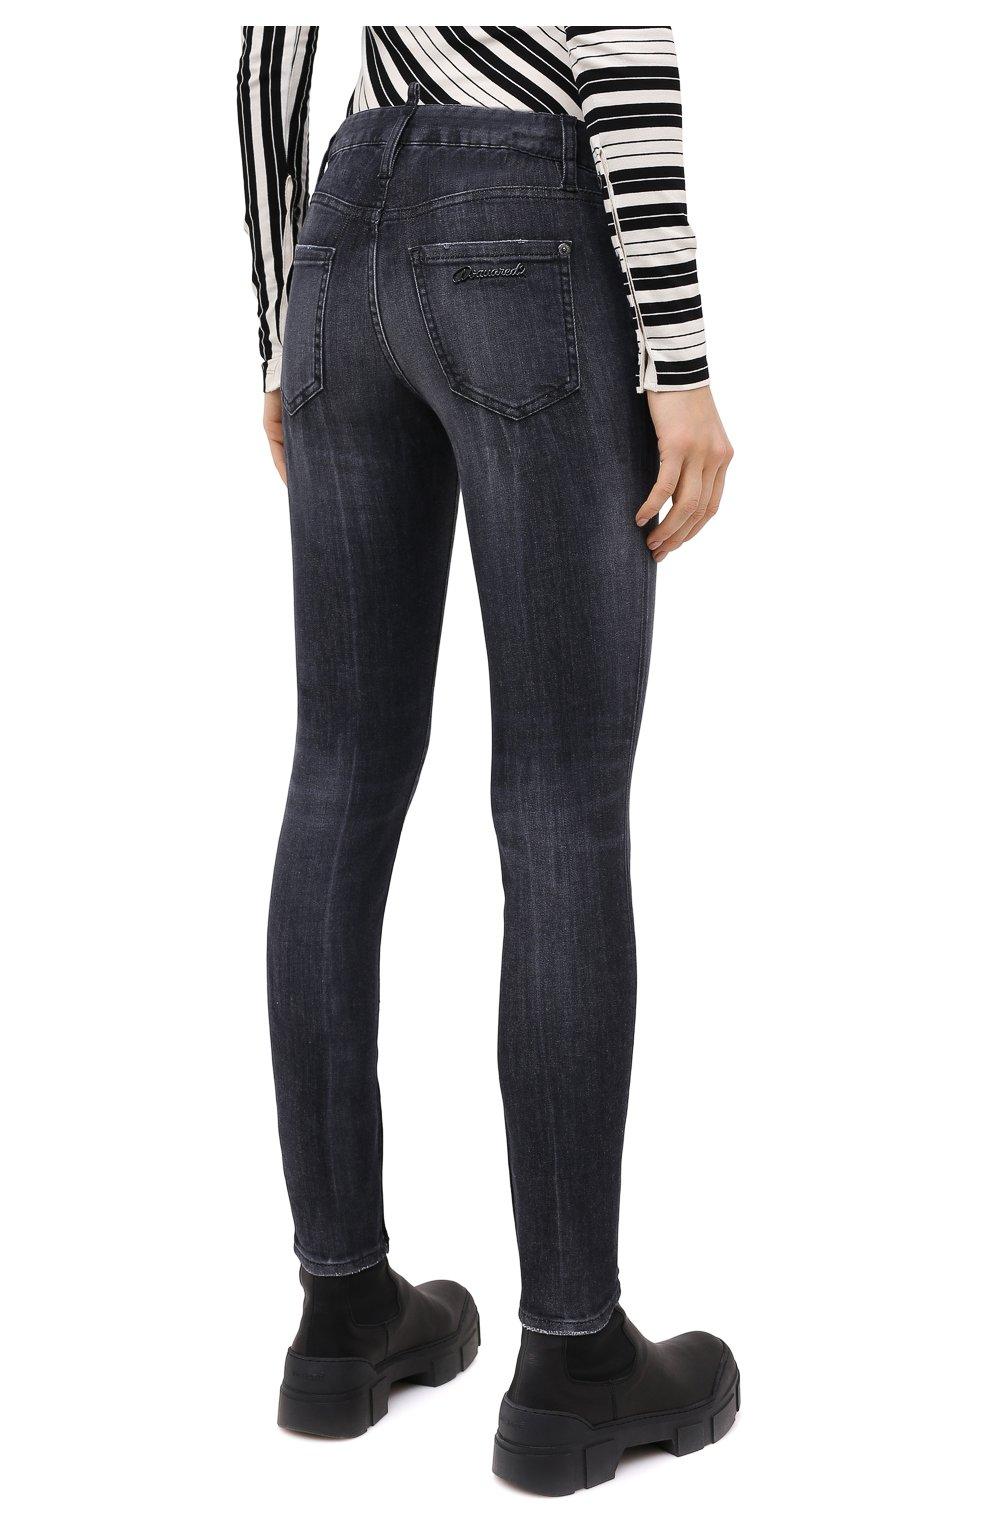 Женские джинсы DSQUARED2 черного цвета, арт. S75LB0381/S30503 | Фото 4